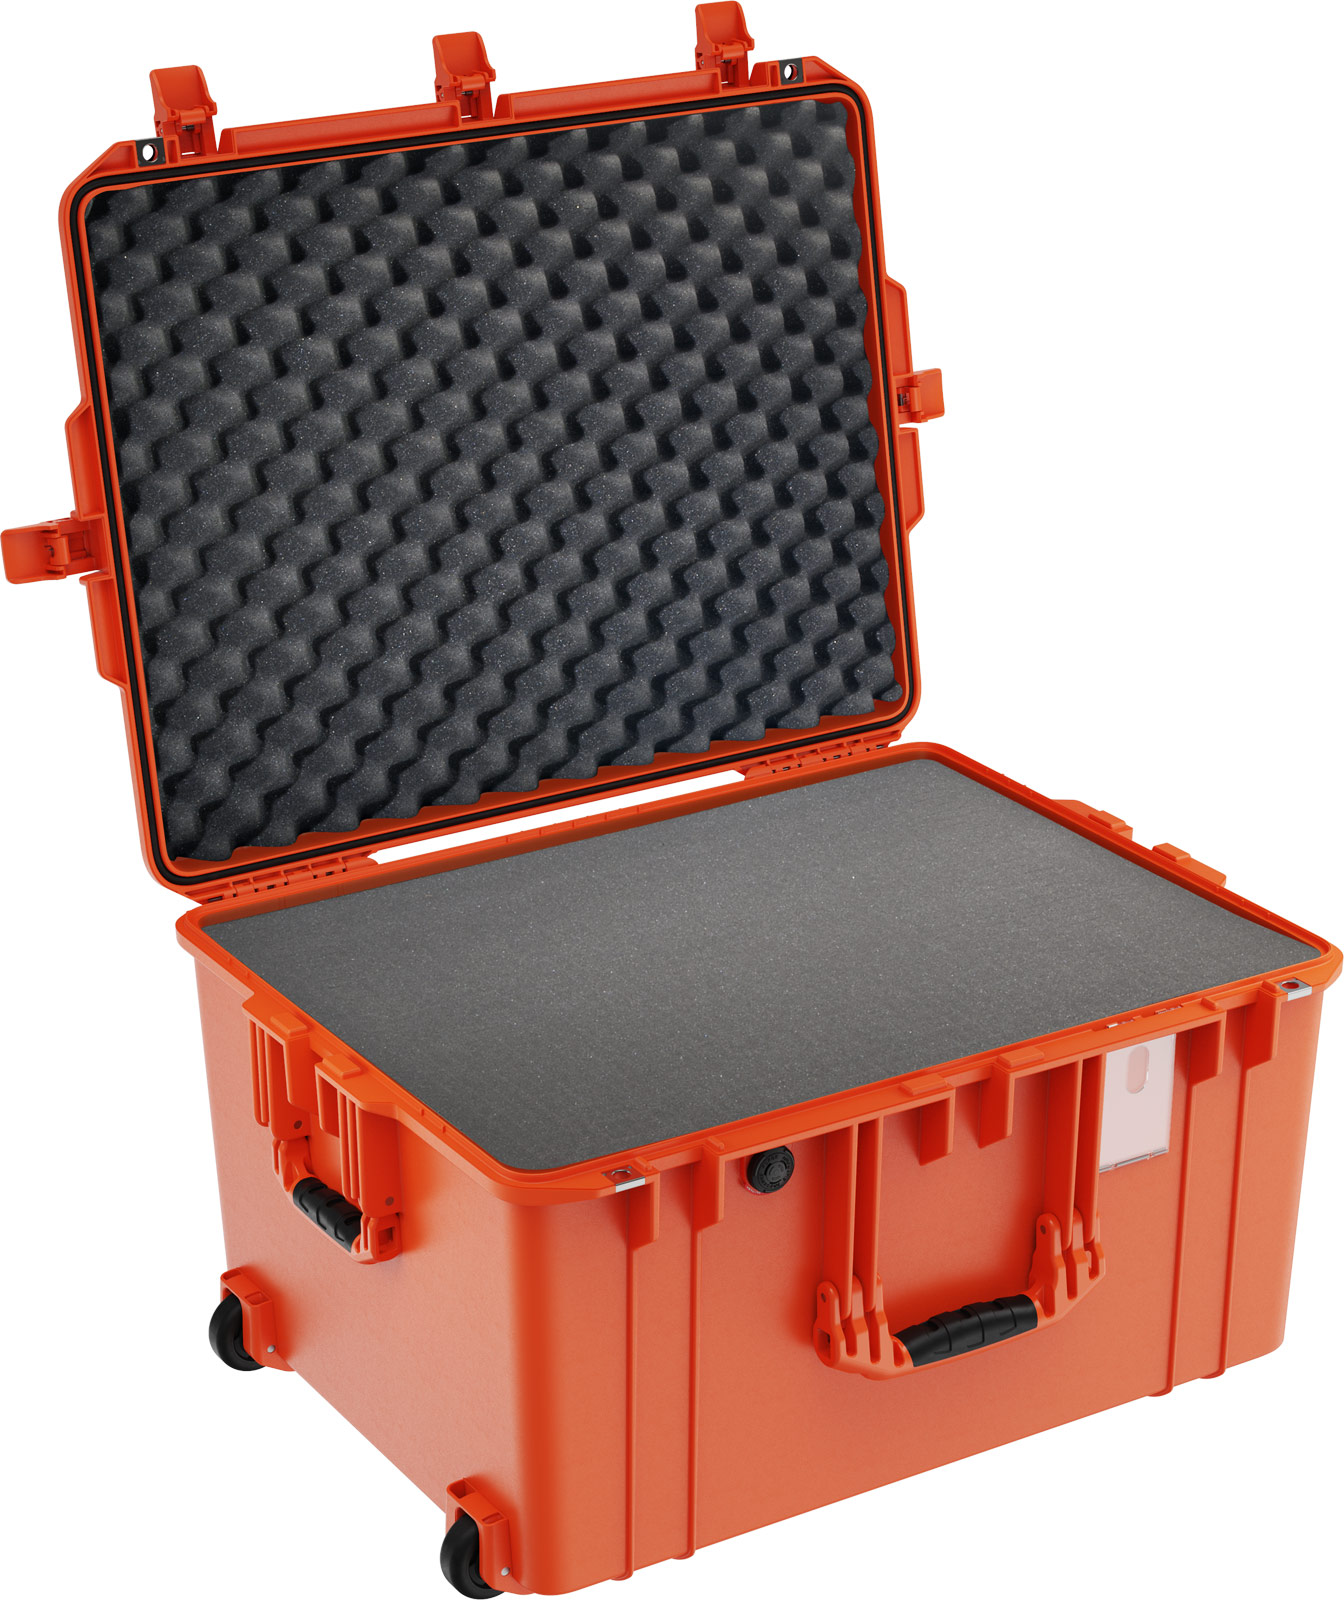 pelican 1637 foam airtight tough orange case